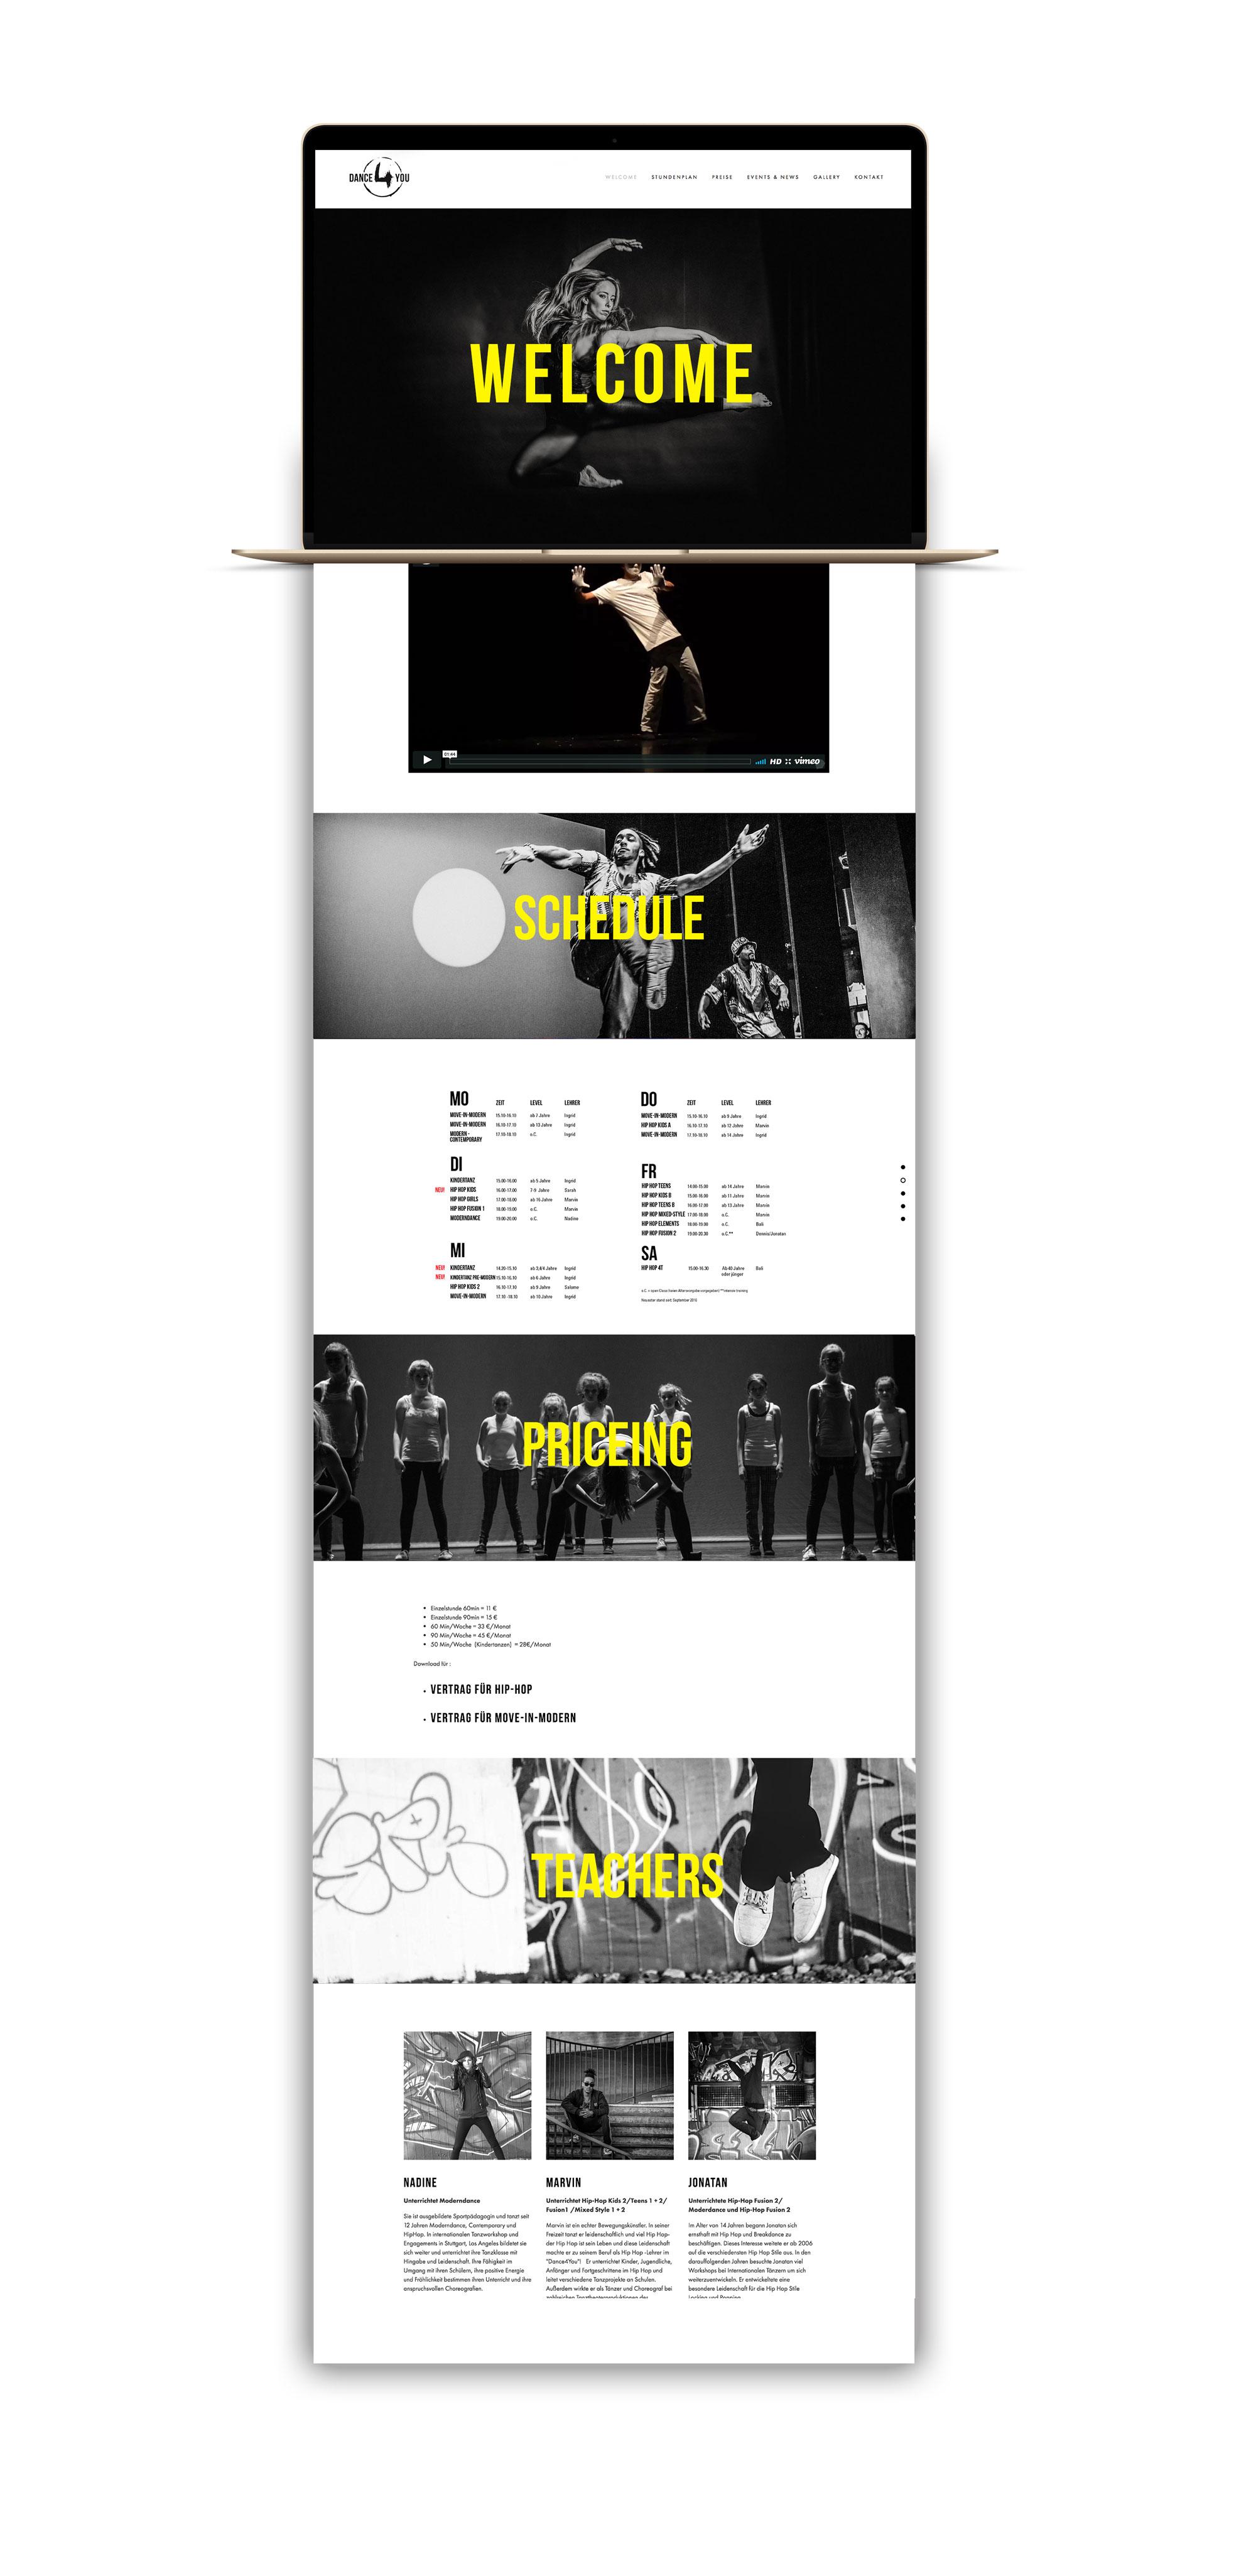 dance-4-you-website---mock-up.jpg